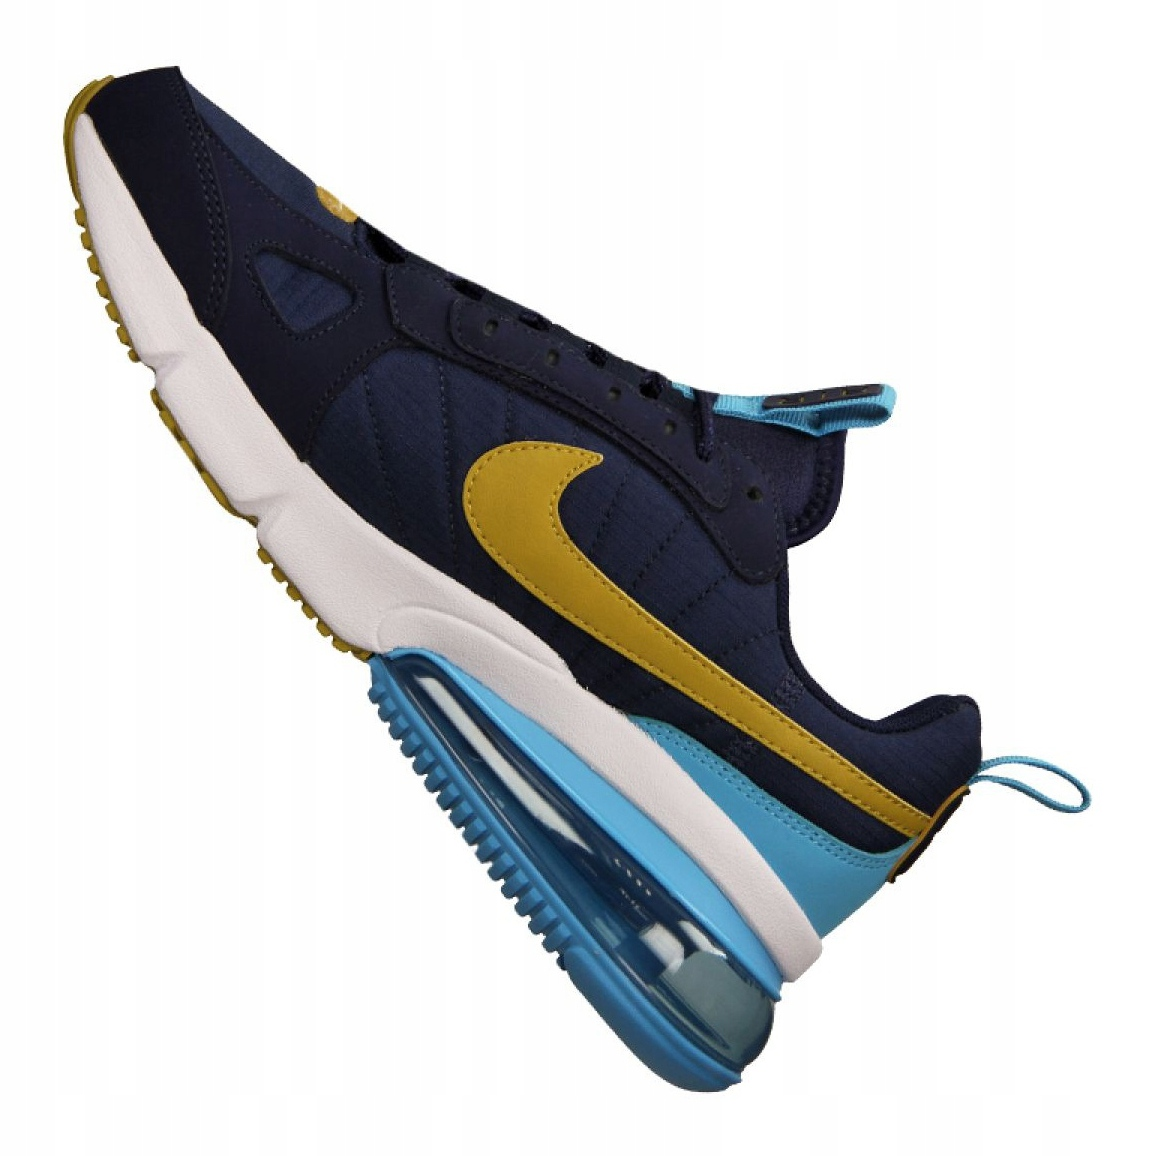 Zapatillas Nike Air Max 270 Futura M AO1569 400 negro